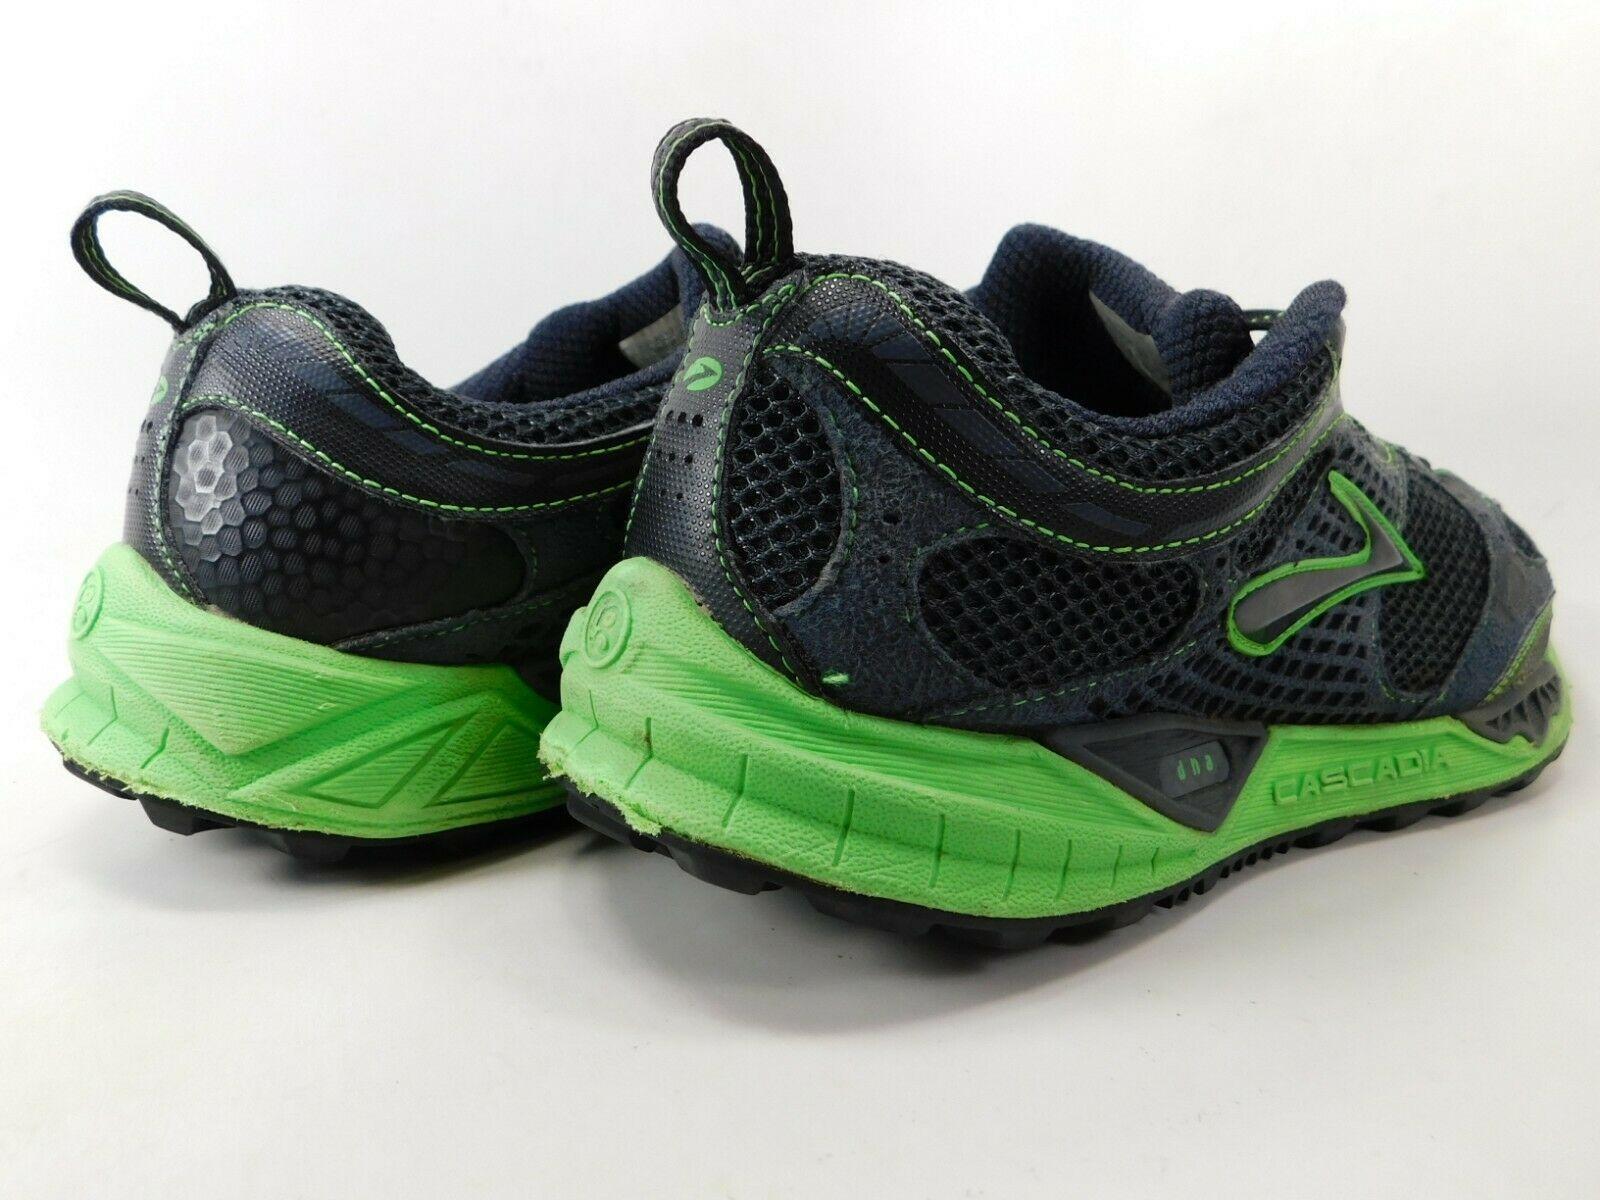 Brooks Cascadia 6 Size US 9.5 M (D) EU 43 Men's Trail Running Shoes Black Indigo